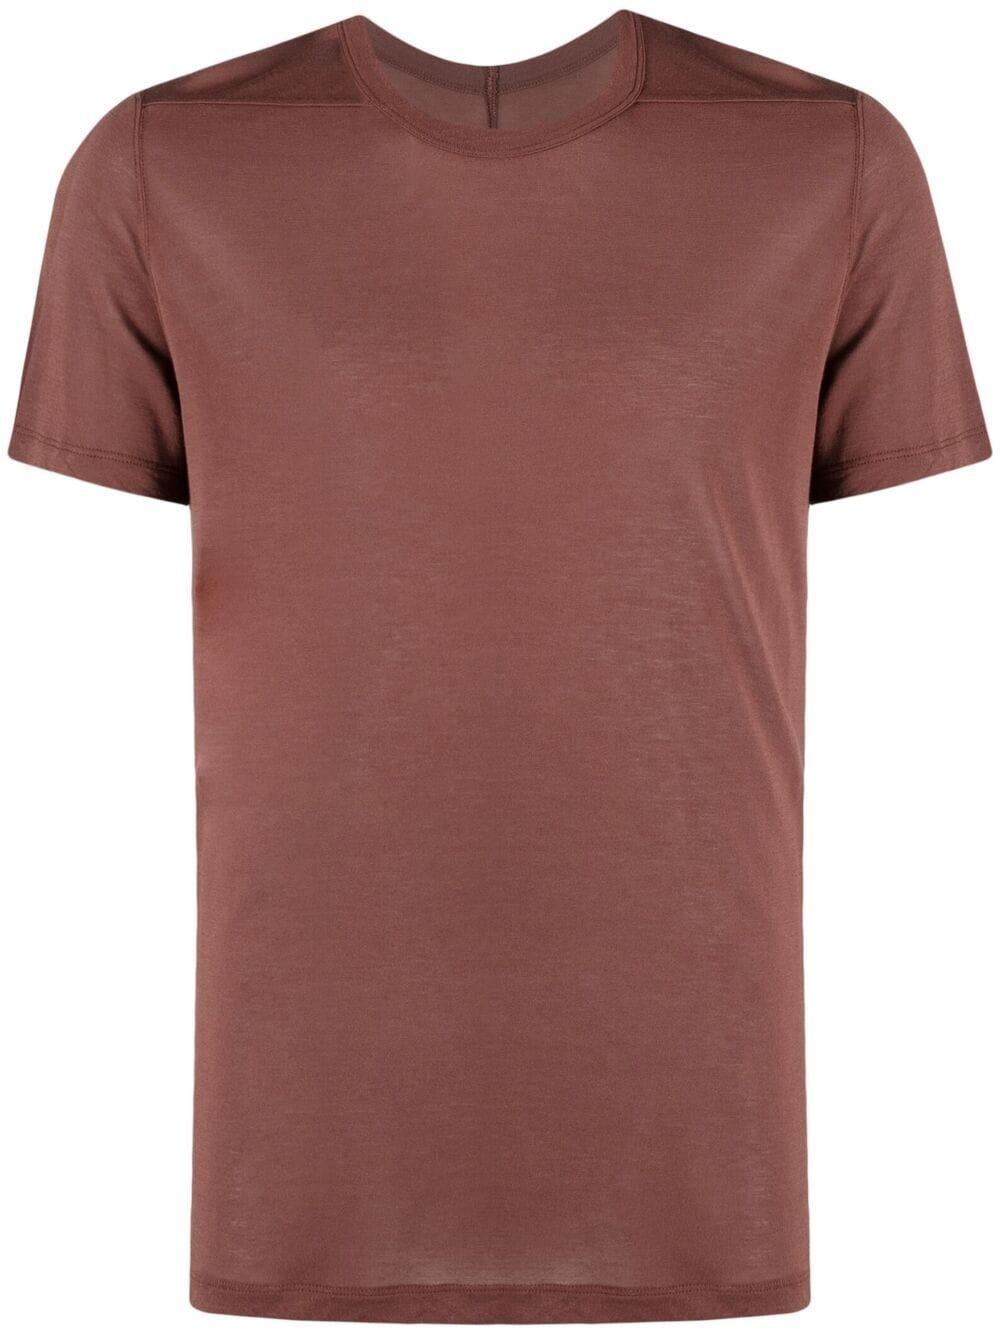 T-shirt seta uomo marrone RICK OWENS | T-shirt | RU21S6265 JS23